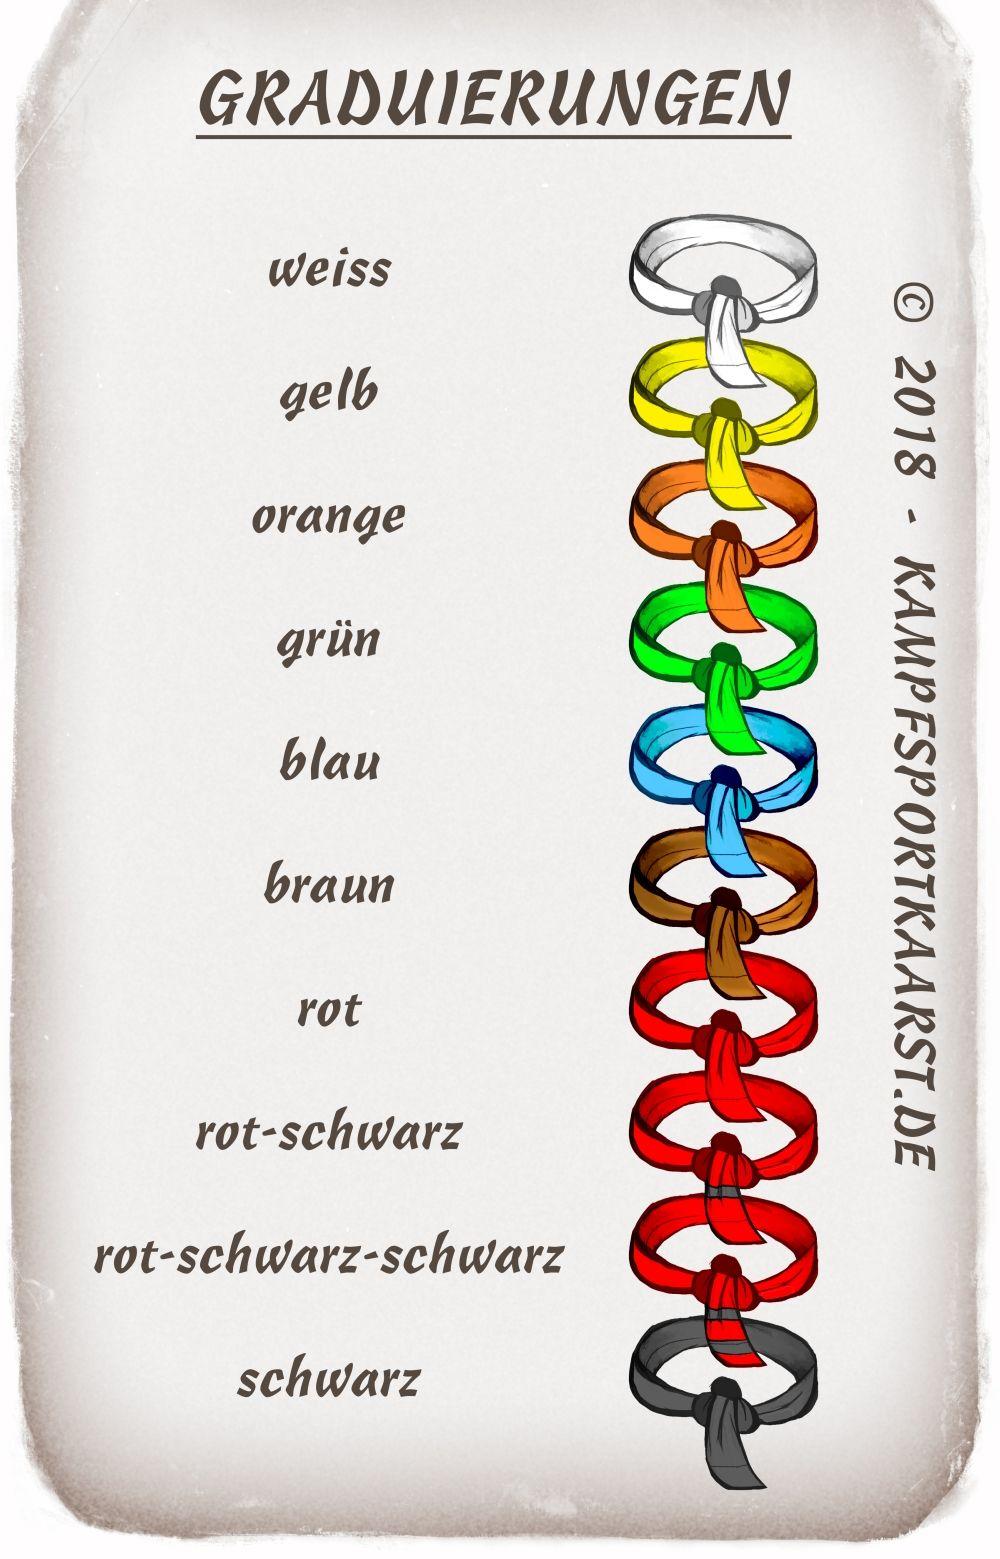 Gürtel-Graduierungen-Sandaboxen-Kampfsportkaarst